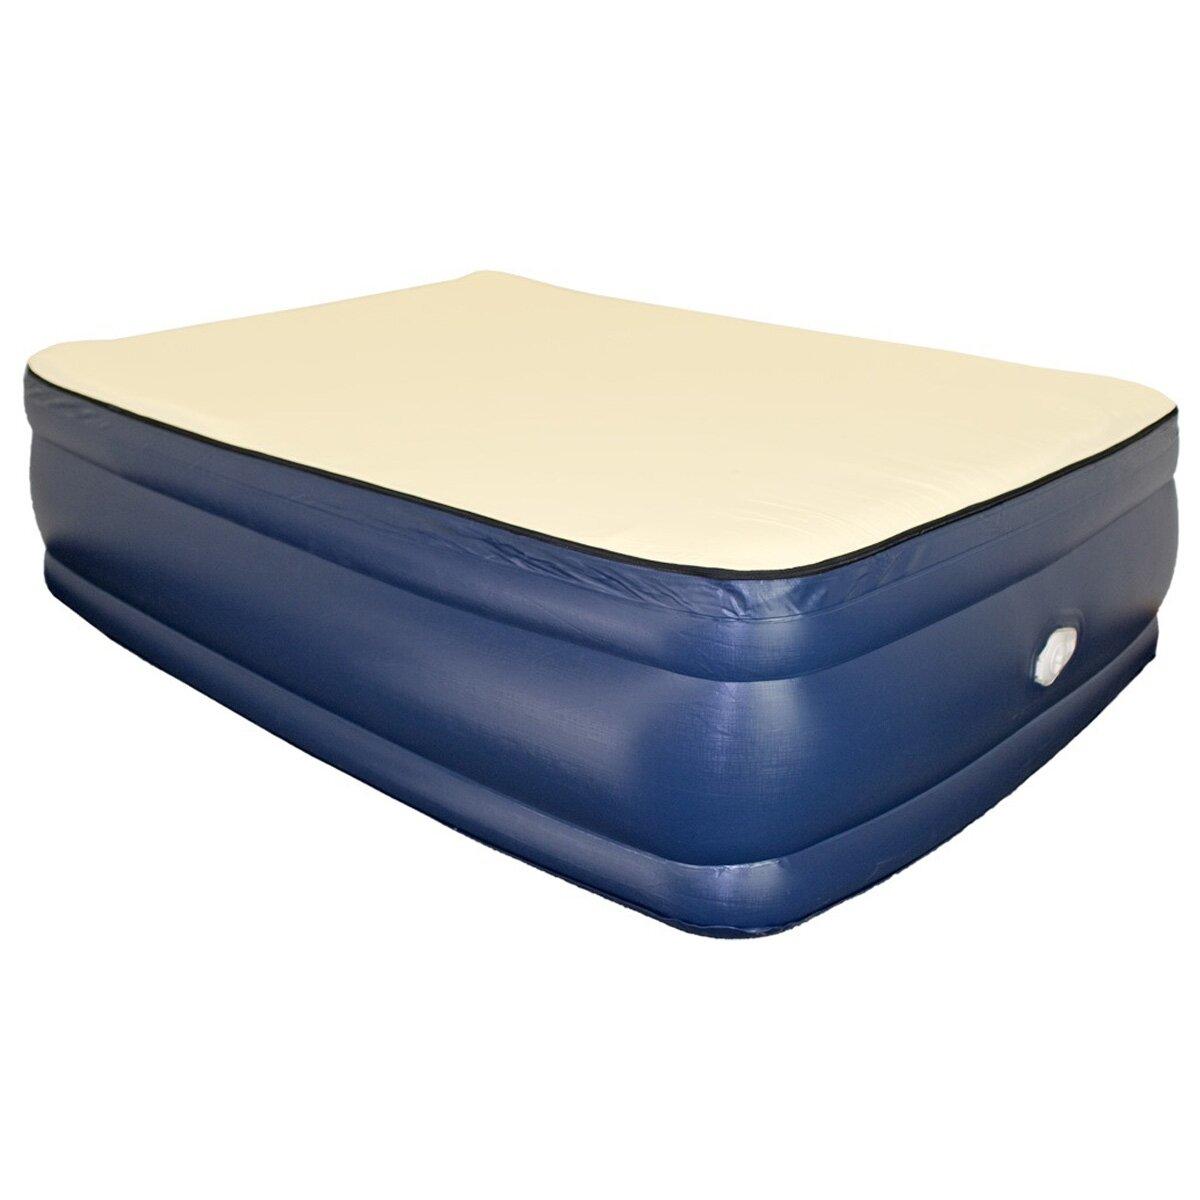 Airtek Foundation 22 Quot Raised Memory Foam Air Mattress With